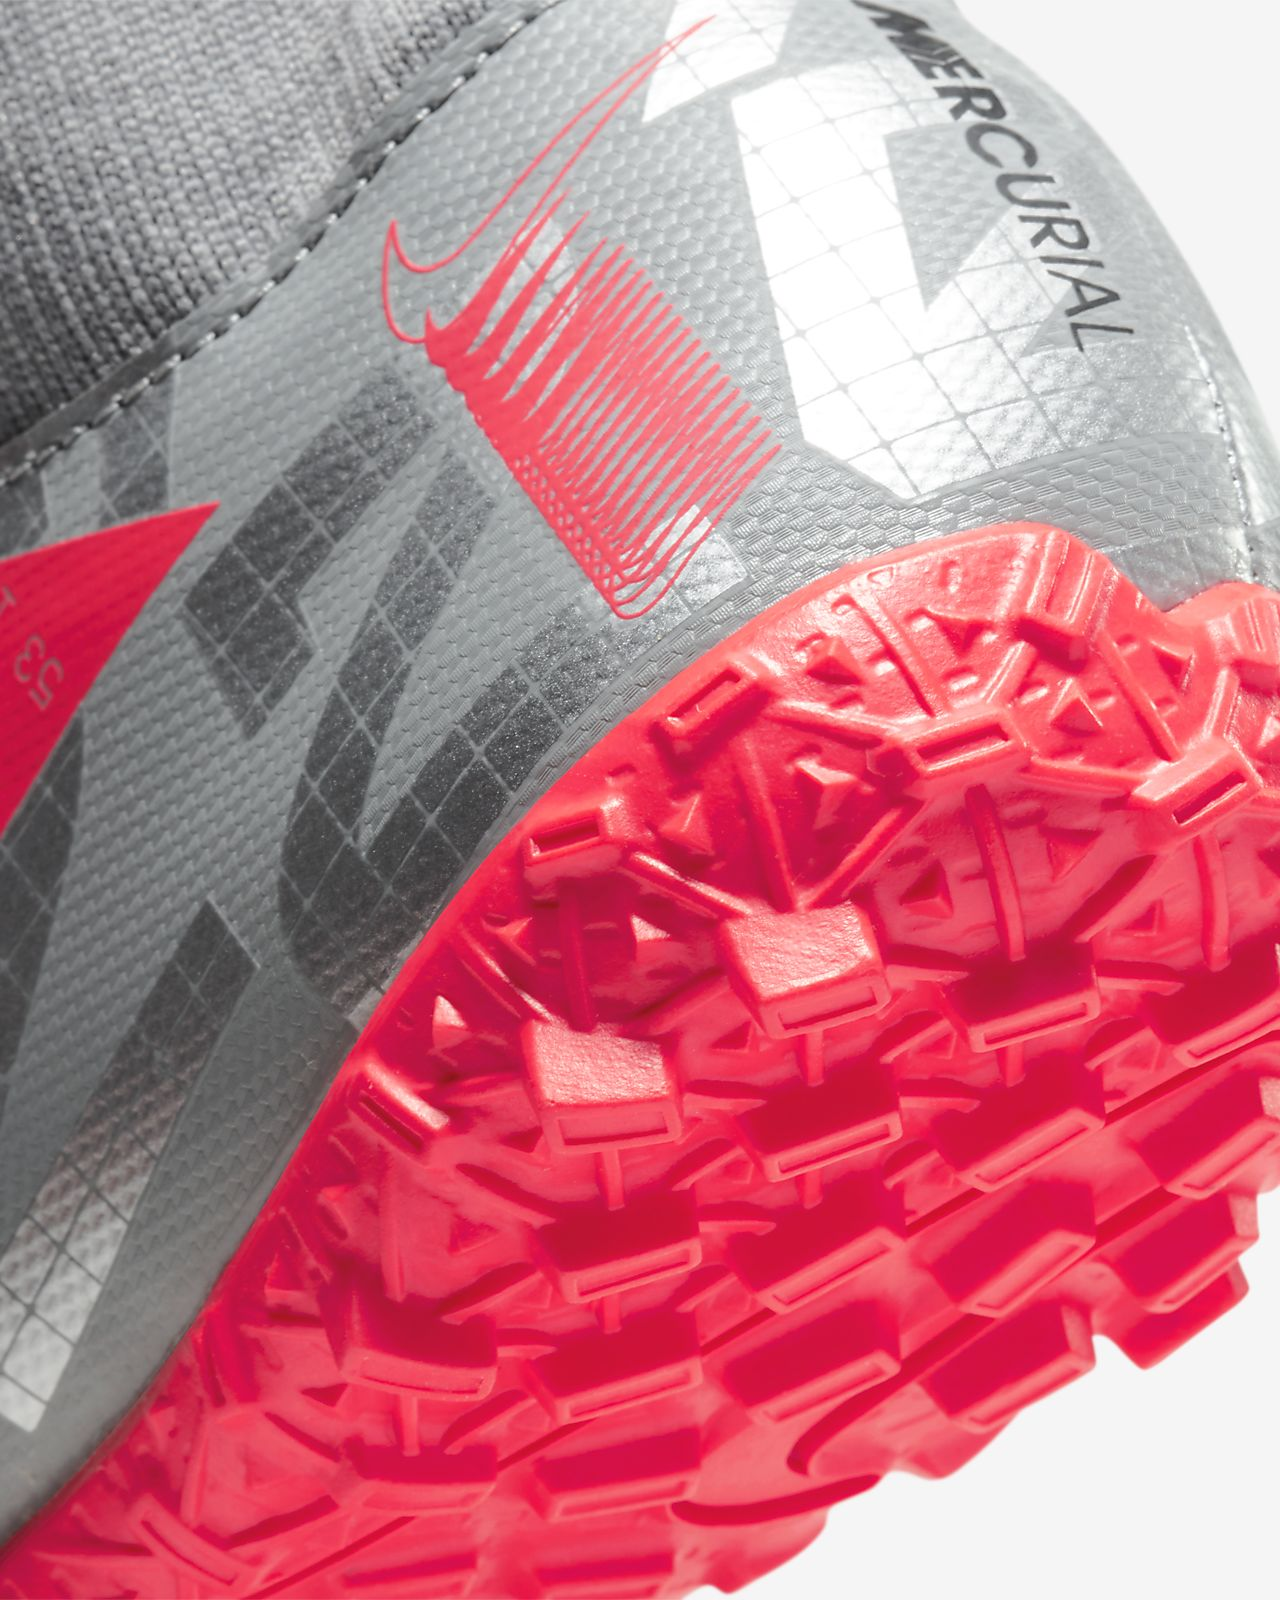 Scarpa da calcio per erba sintetica Nike Jr. Mercurial